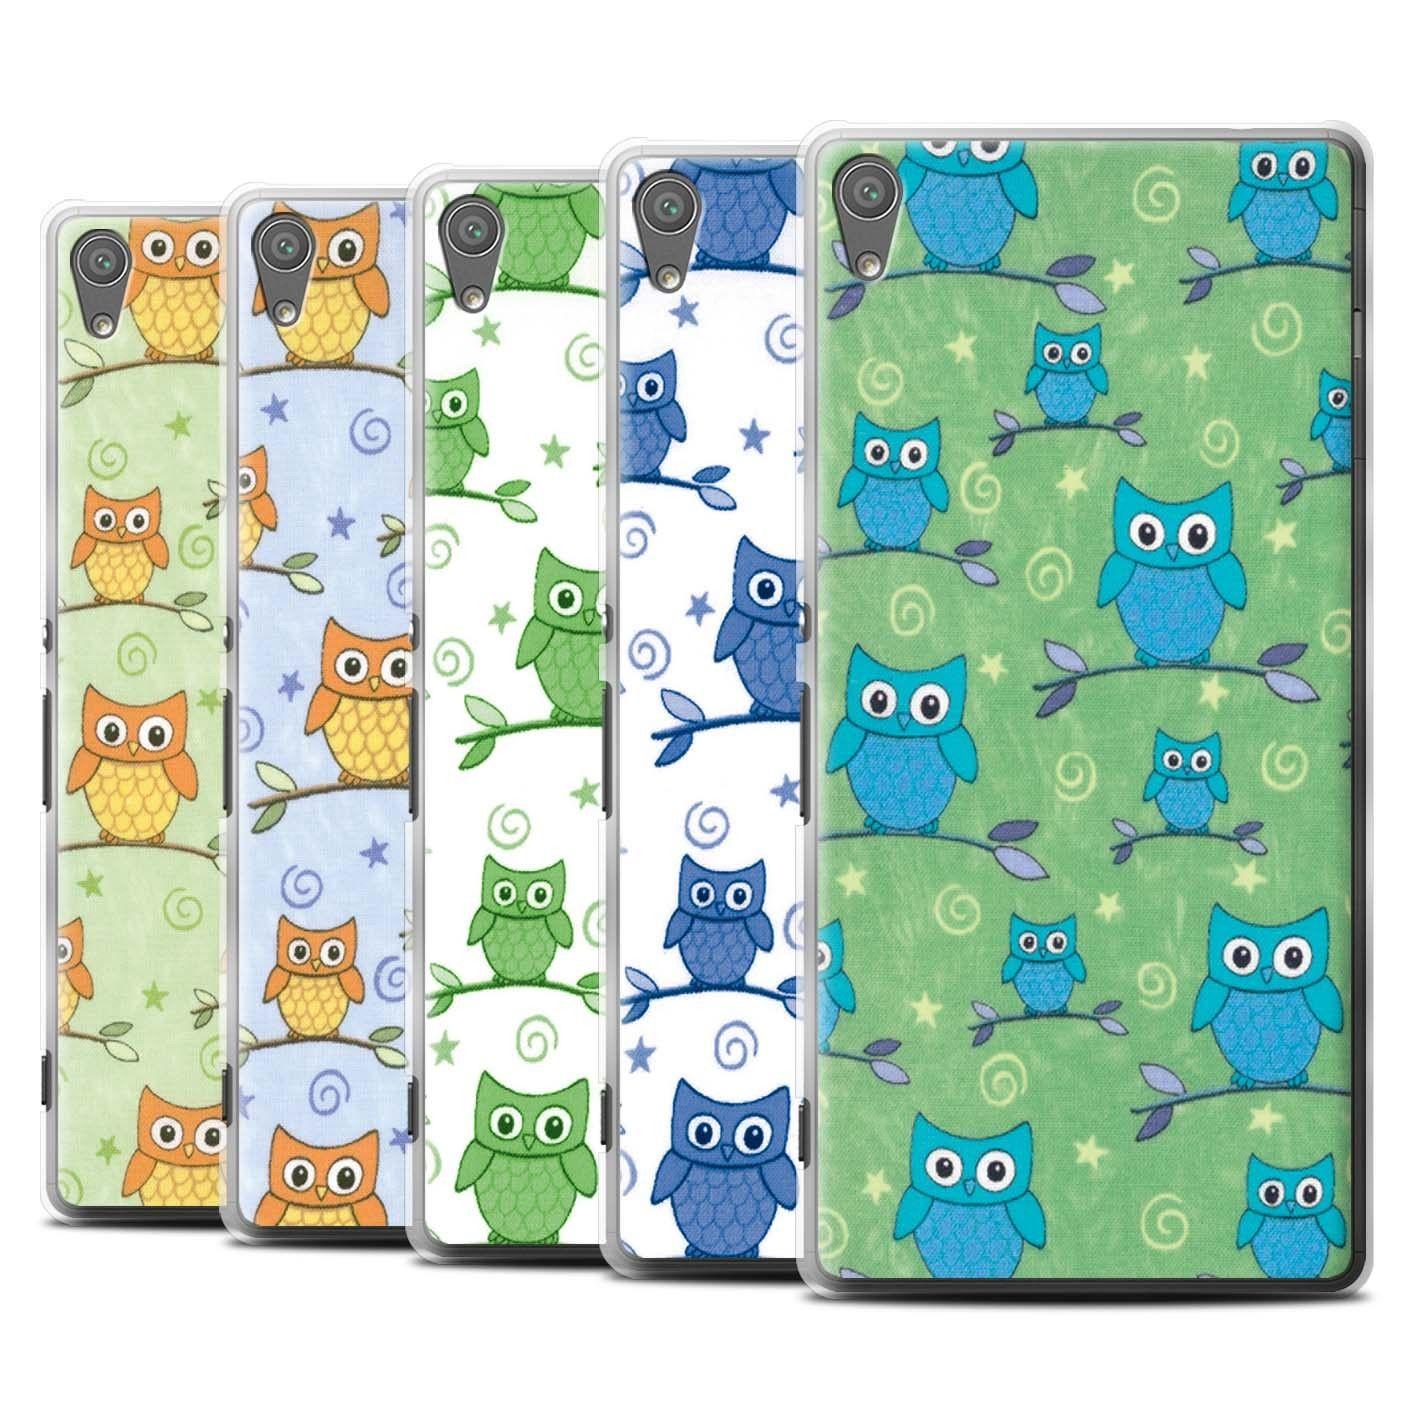 STUFF4 Phone Case Cover for Sony Xperia XA Ultra F3212 F3216 Cute Owl Pattern